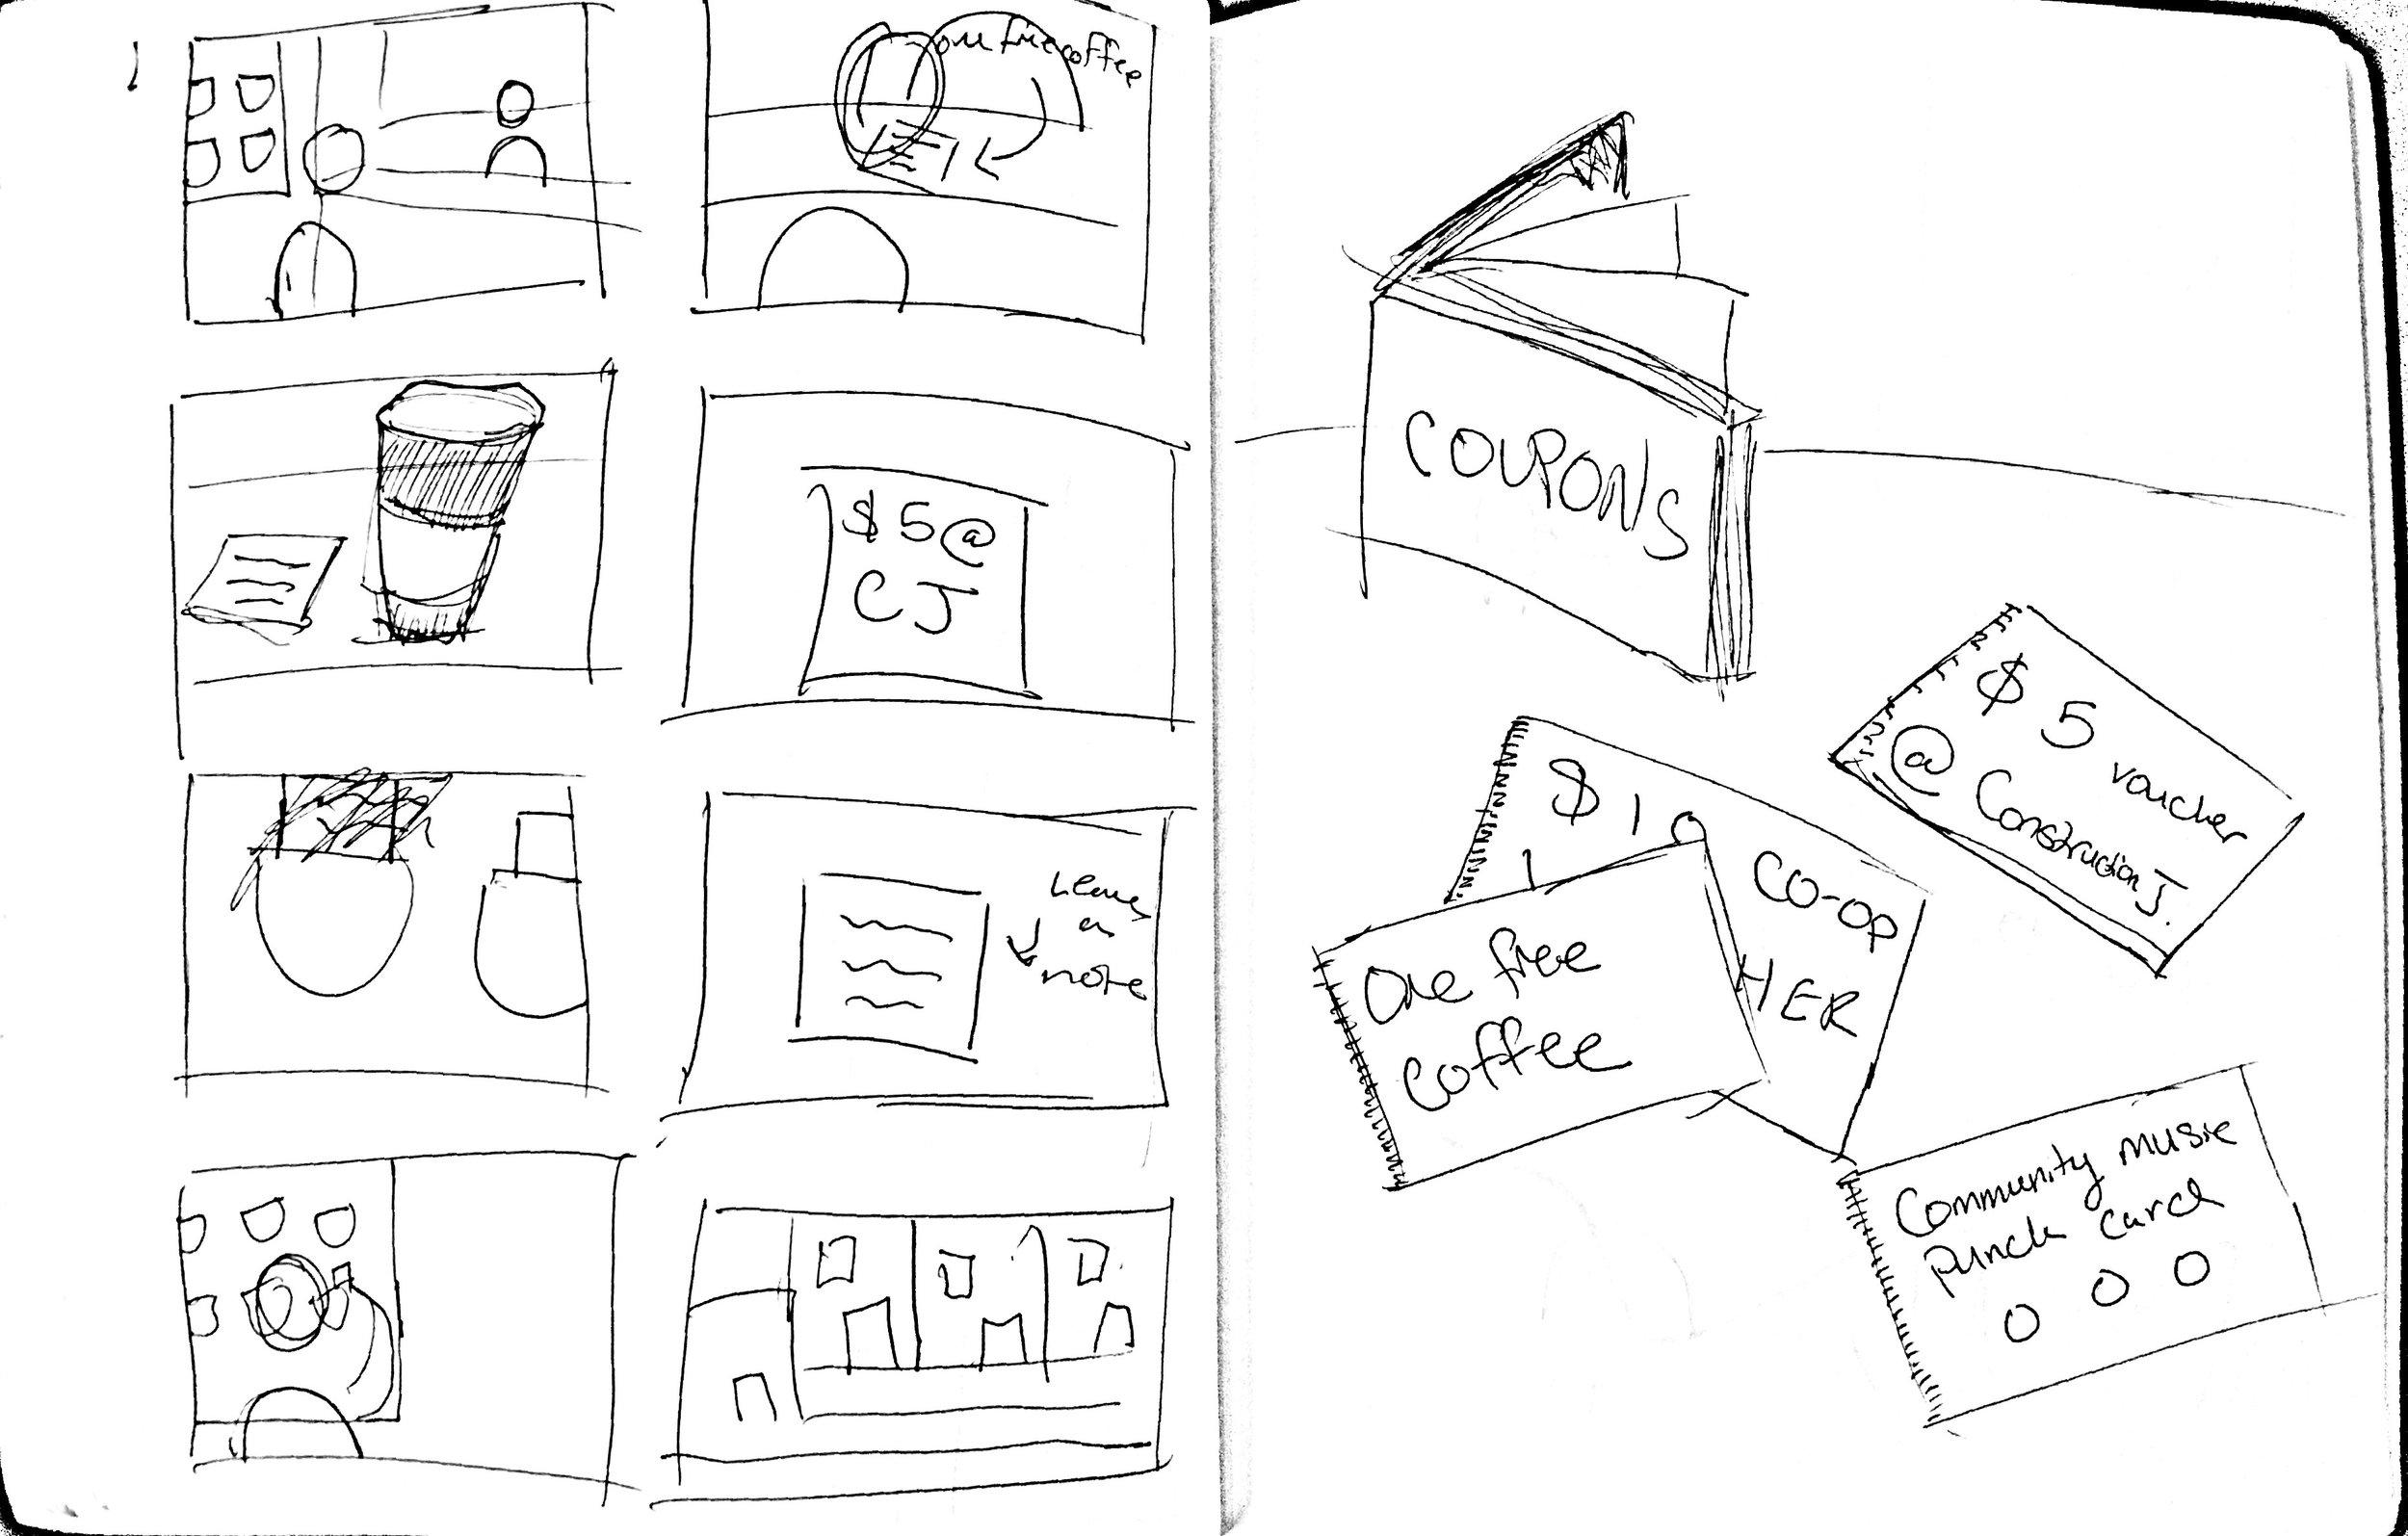 Coupon book storyboard